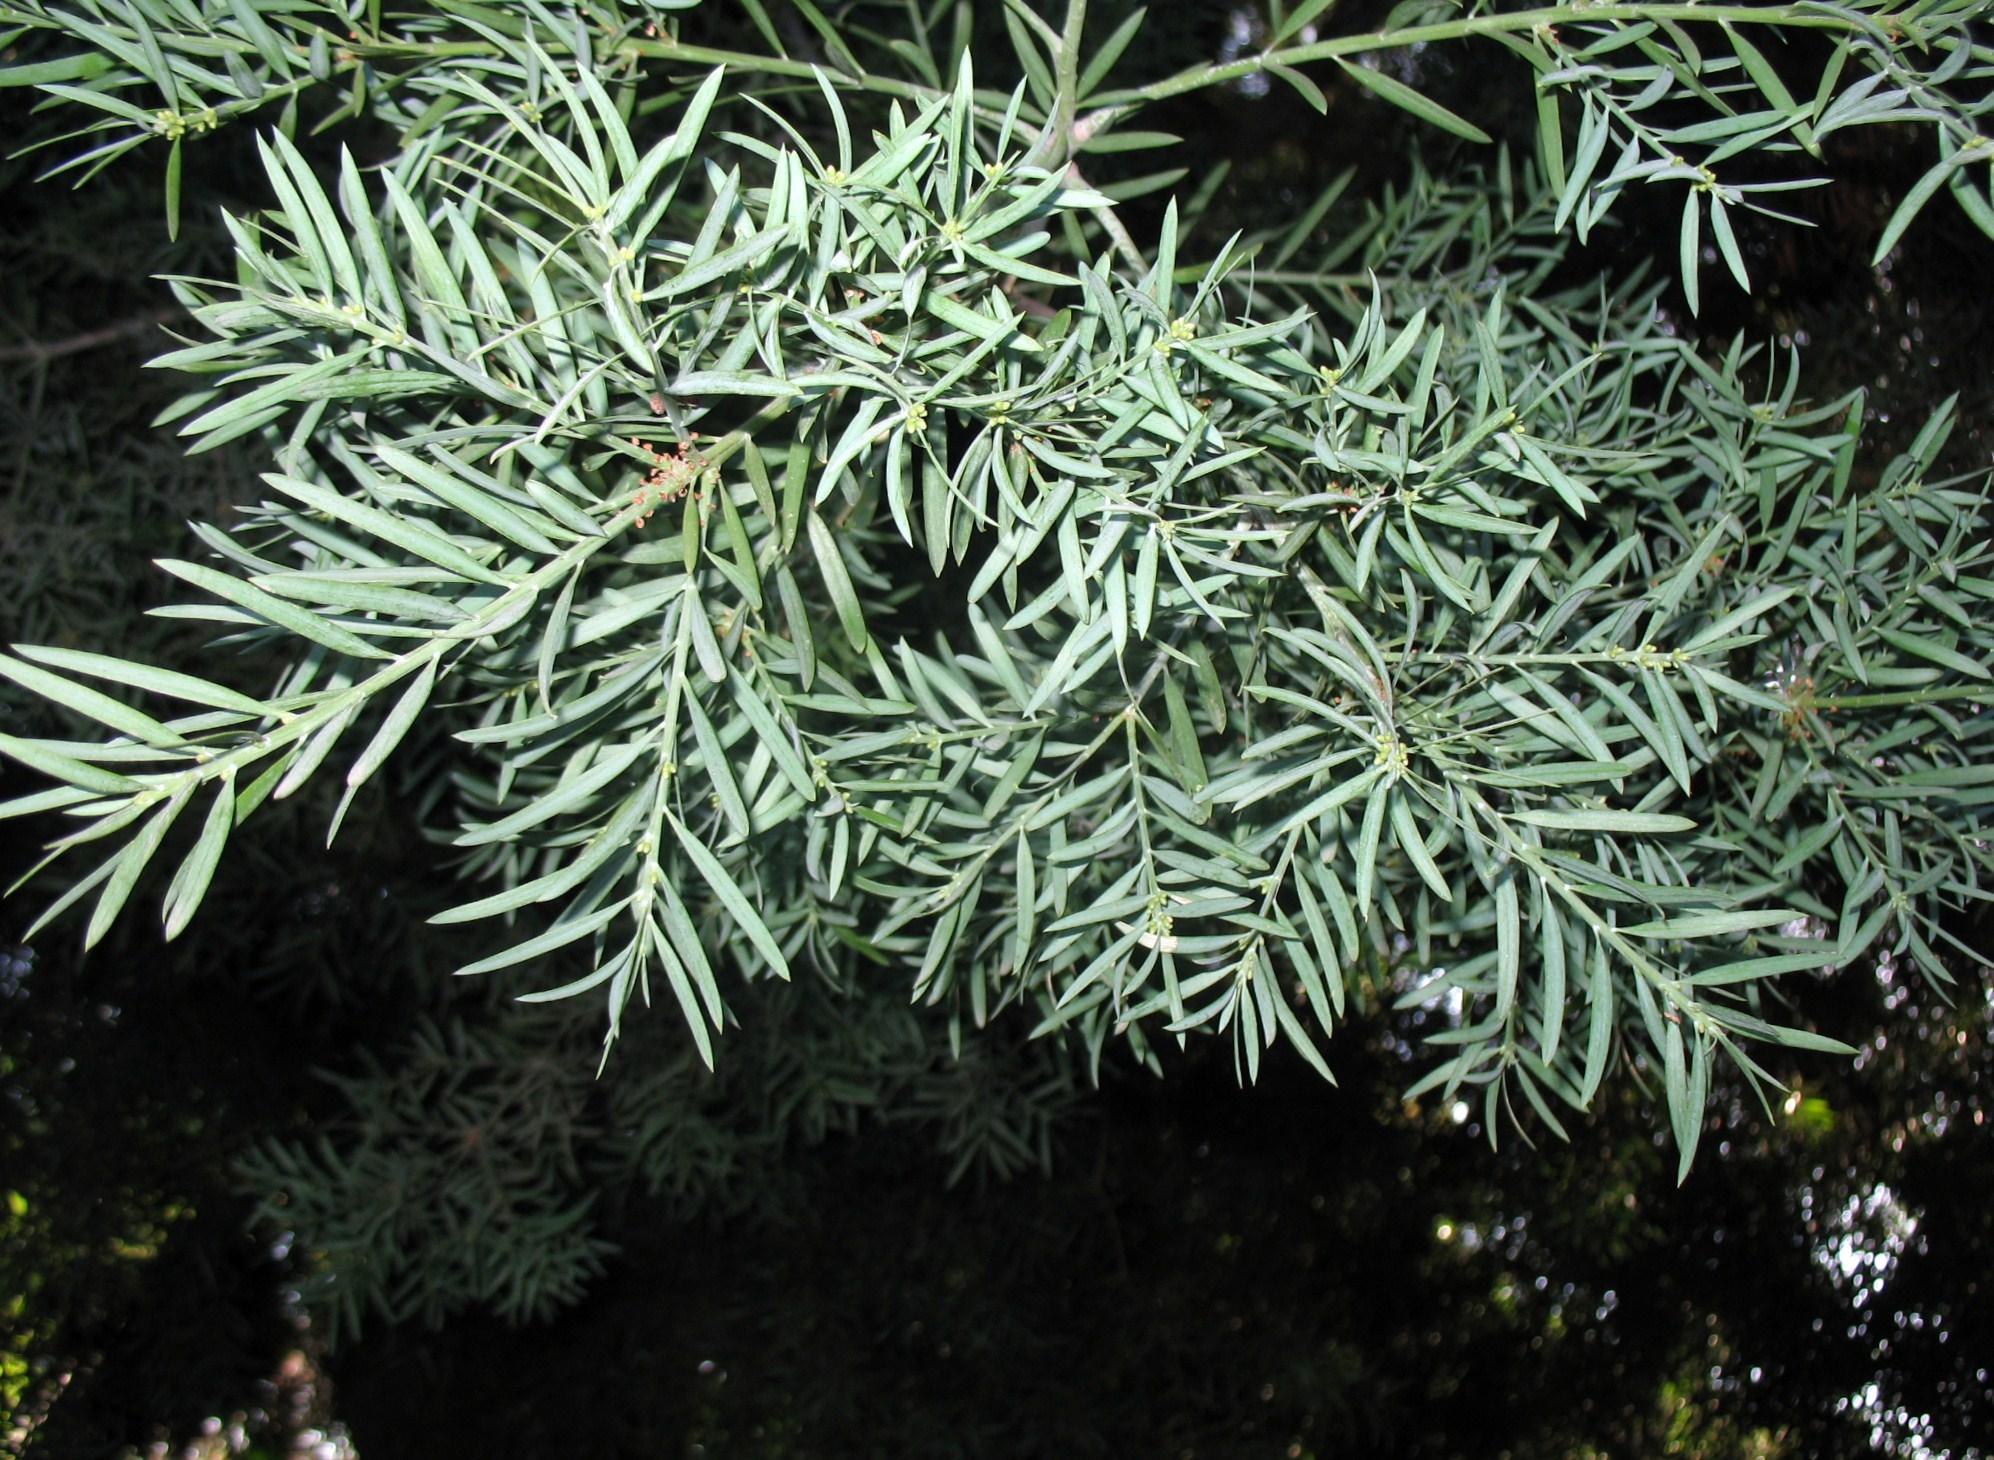 Afrocarpus falcata / Afrocarpus falcata